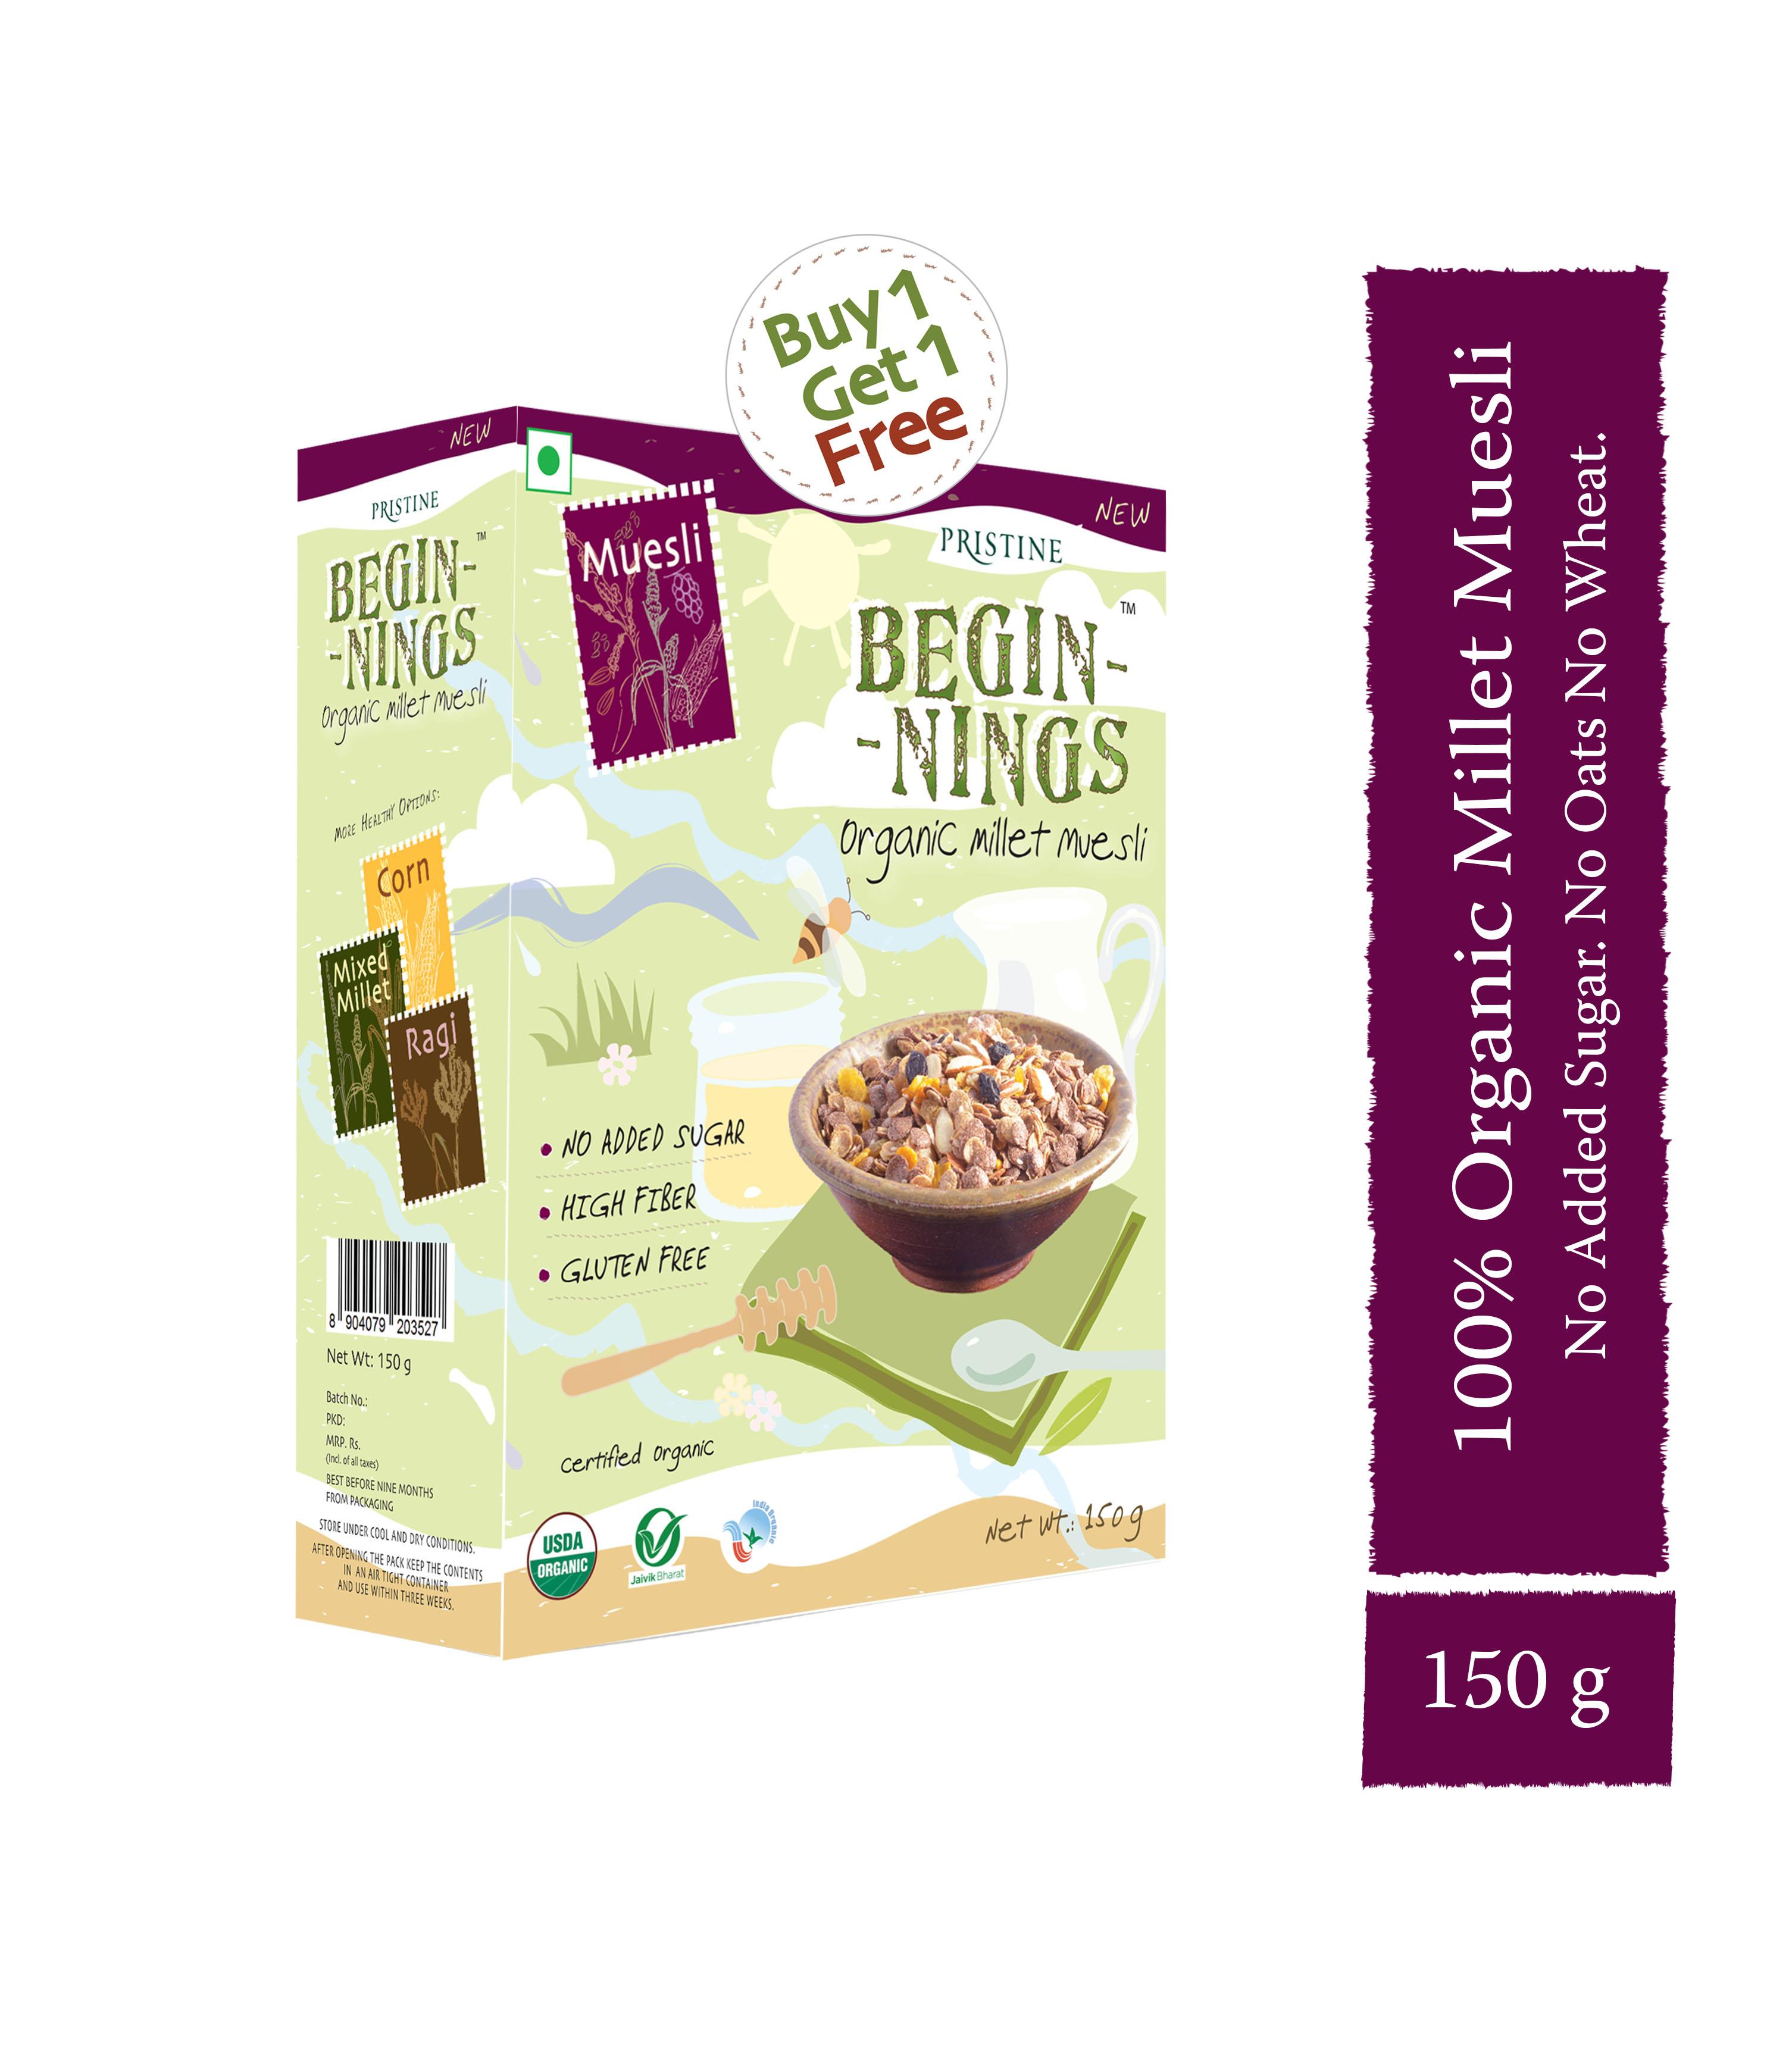 millet muesli - organic breakfast cereals - Pristine Organics